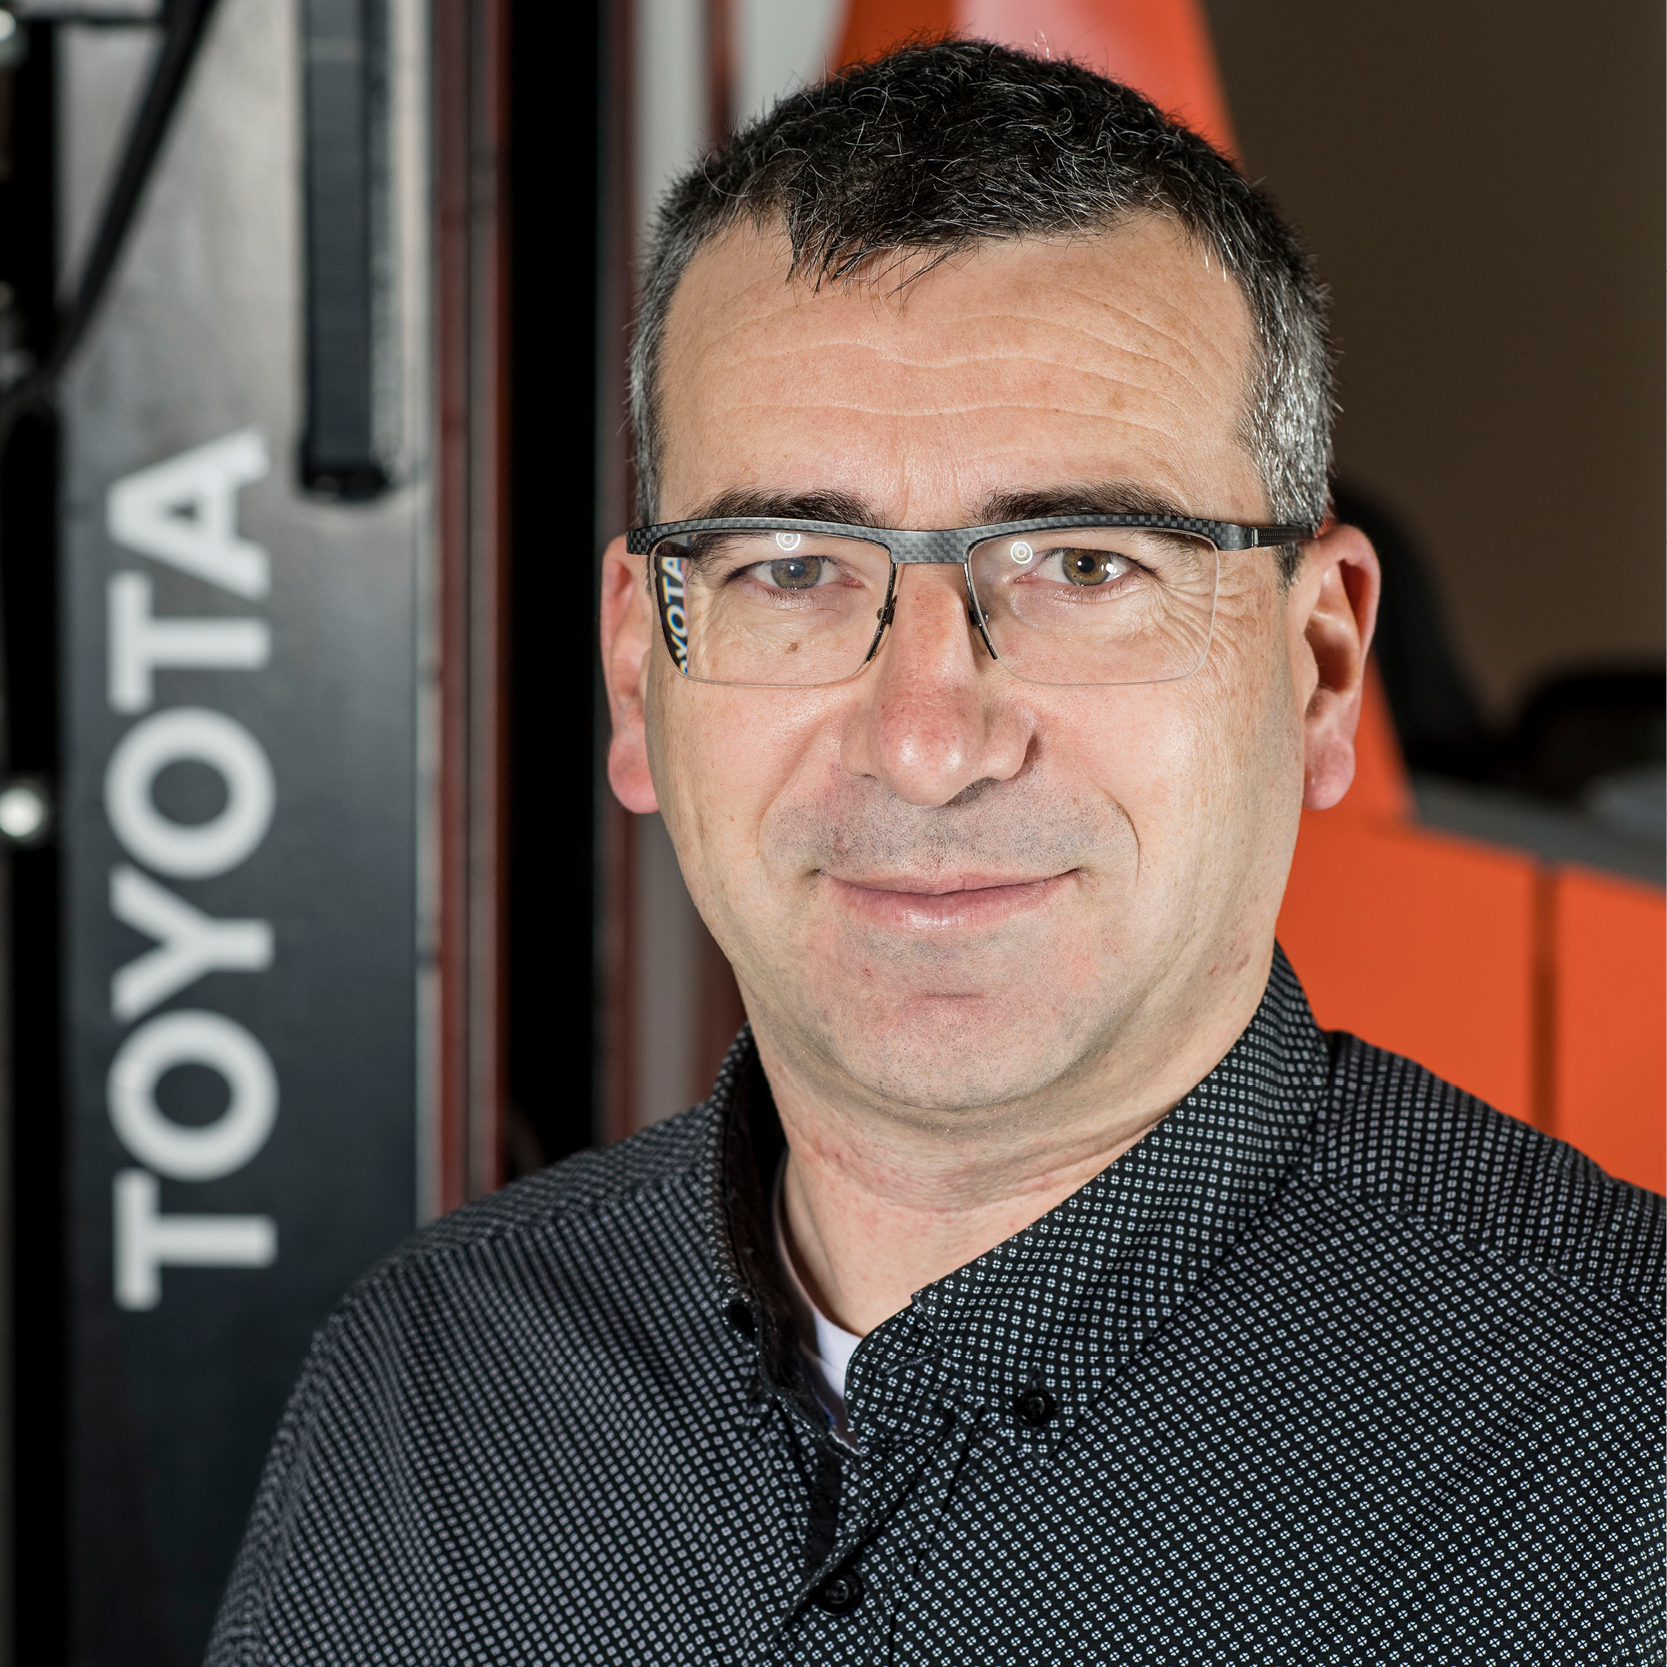 Carlos Kiekens